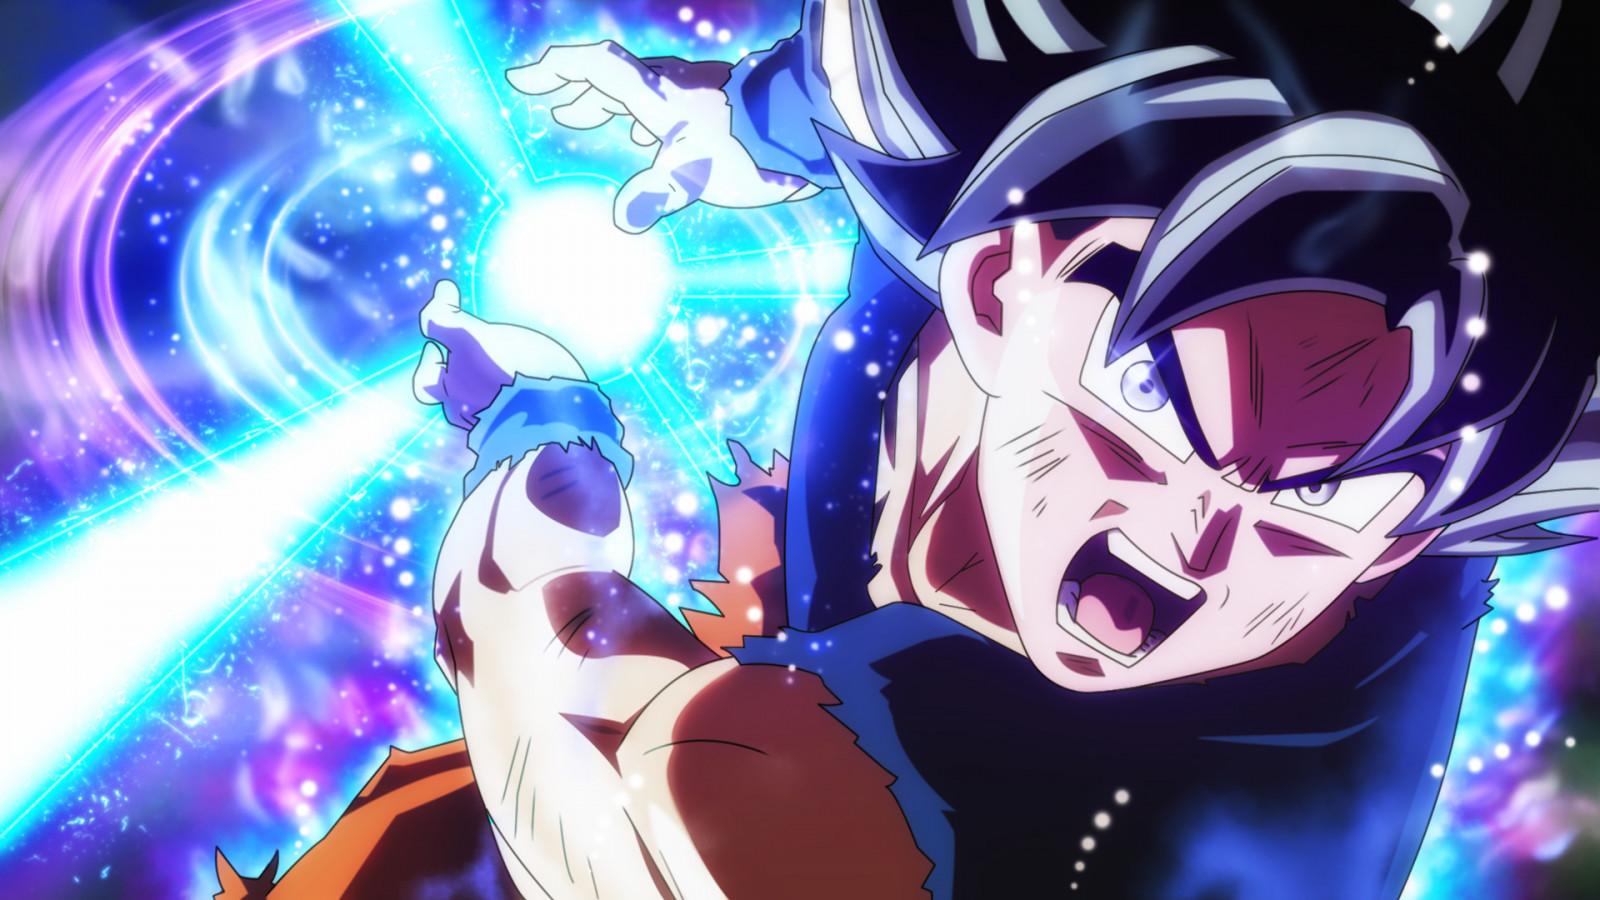 Goku Ultra Instinto Fondos De Pantalla Wallpaper: Fondos De Pantalla : Dragon Ball Super, Son Goku, Ultra